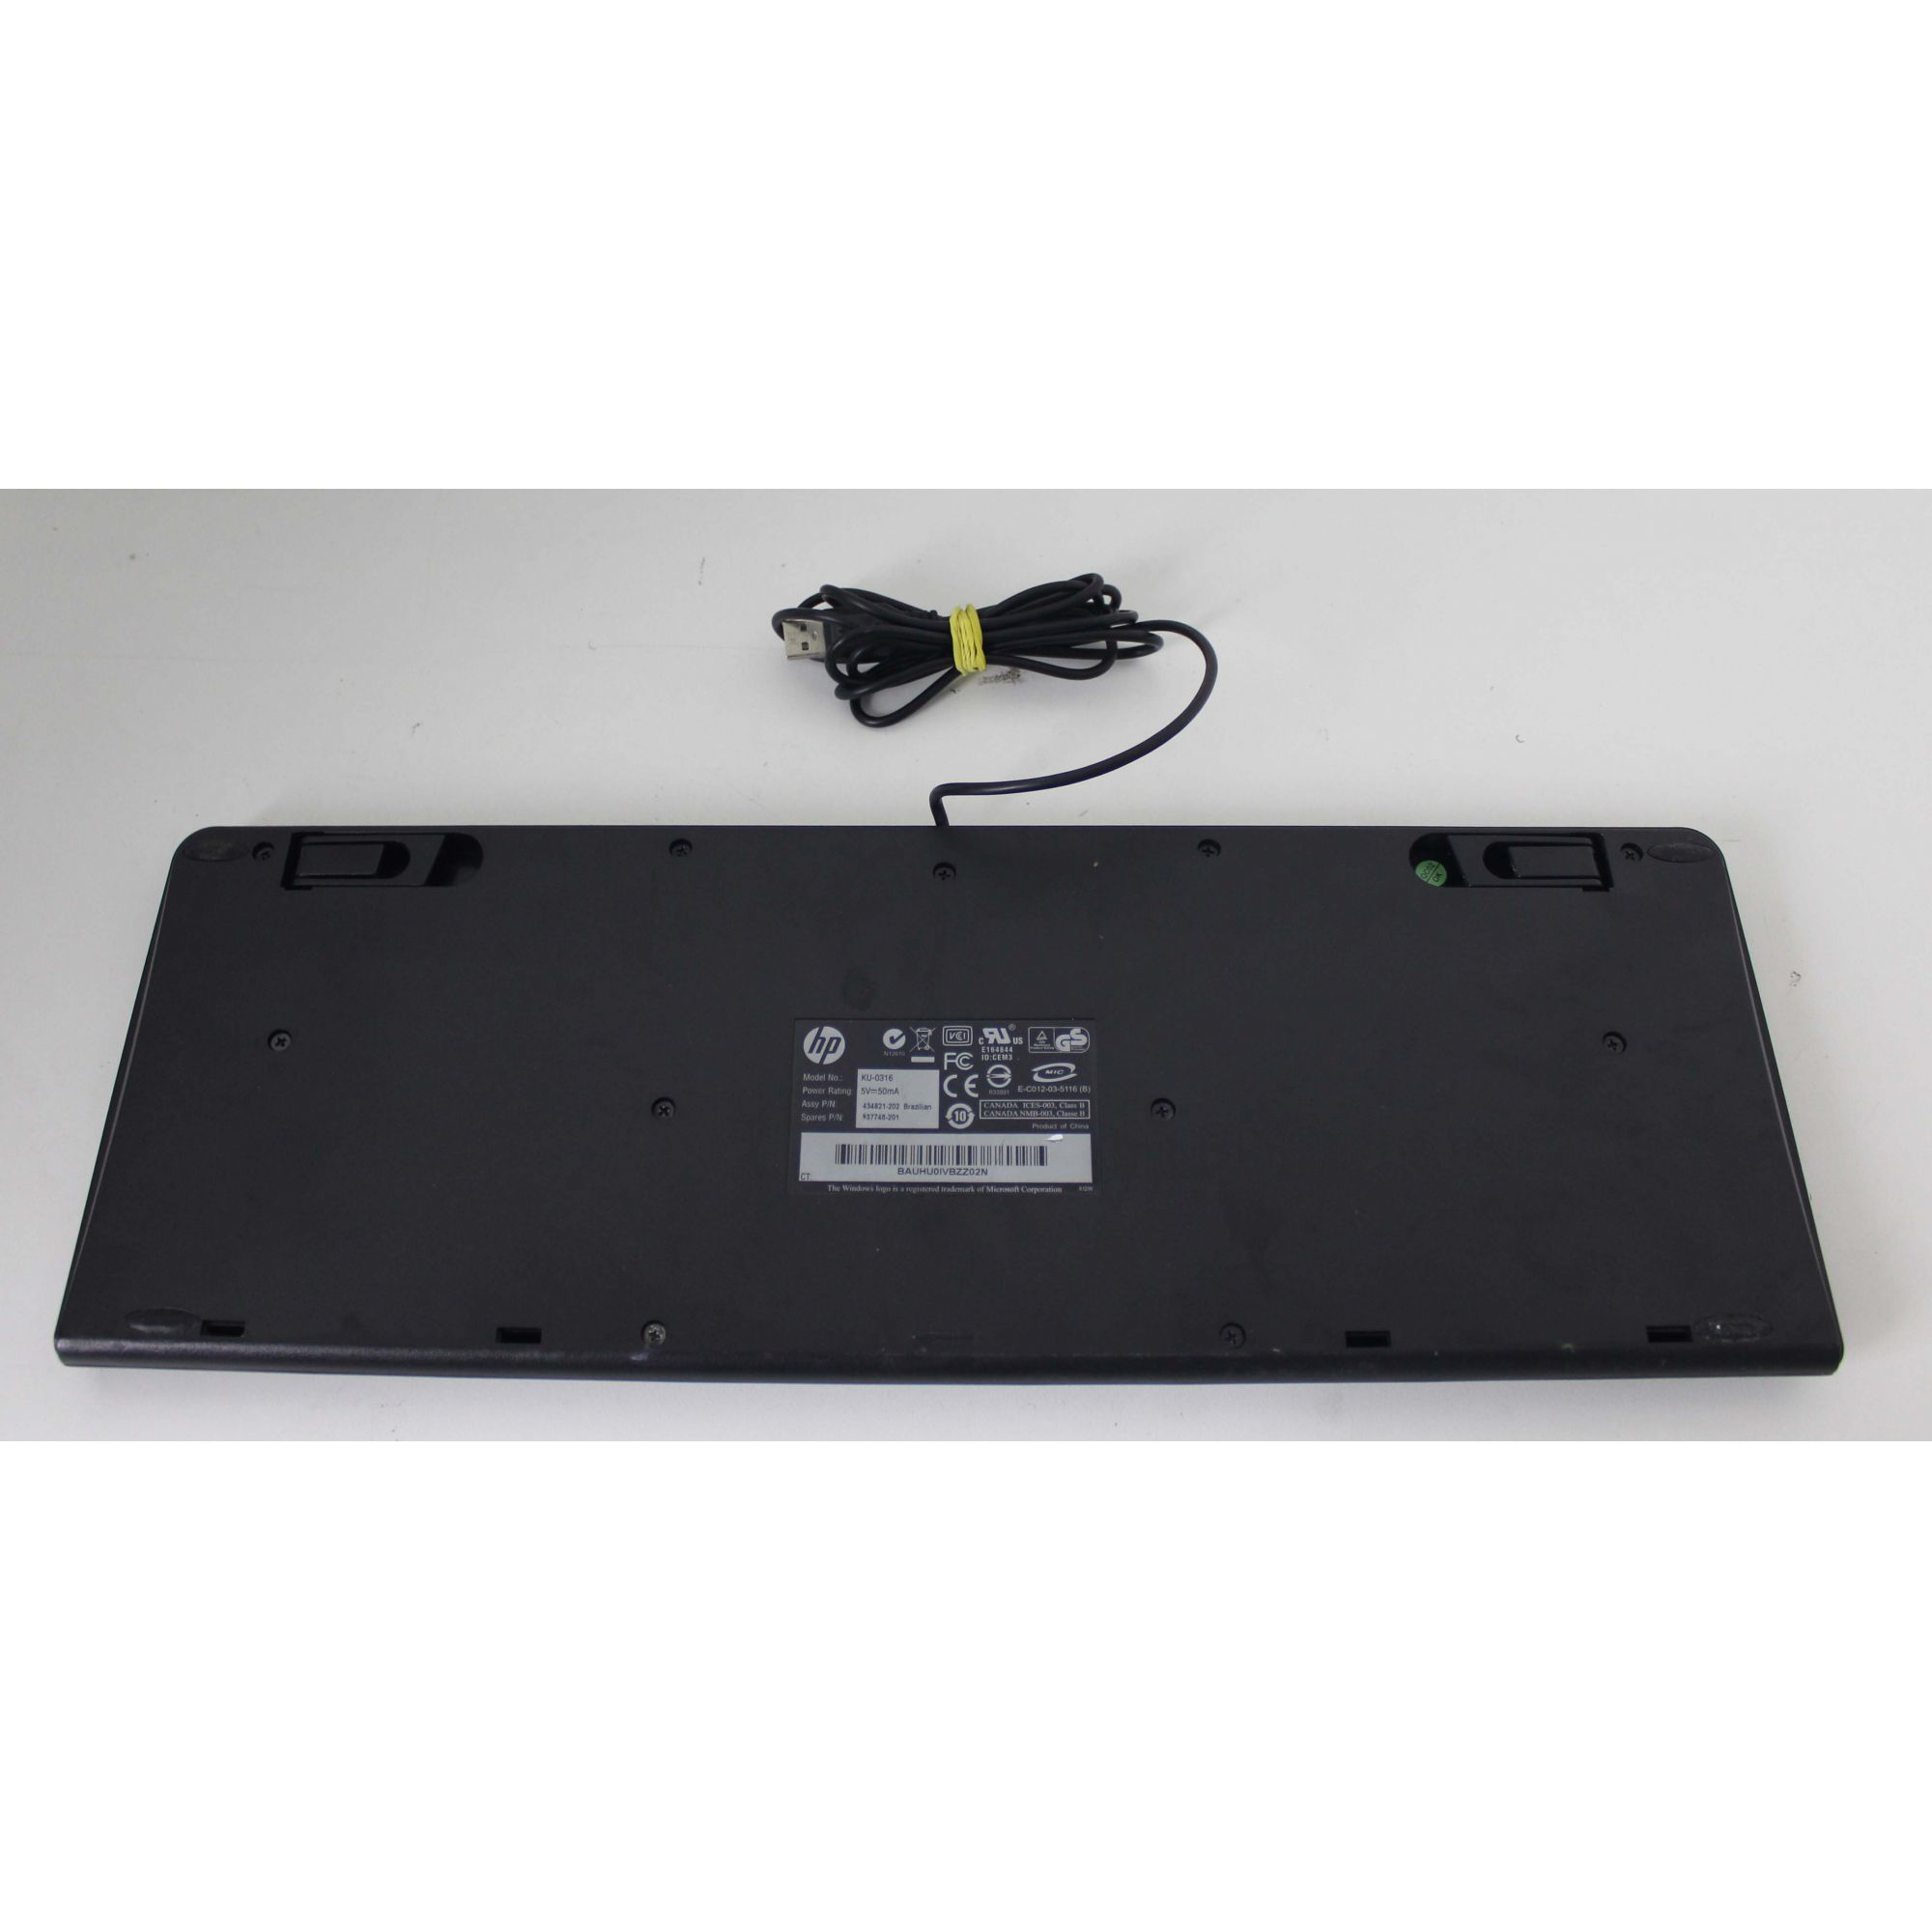 Teclado HP USB KU-0316 + Alpha